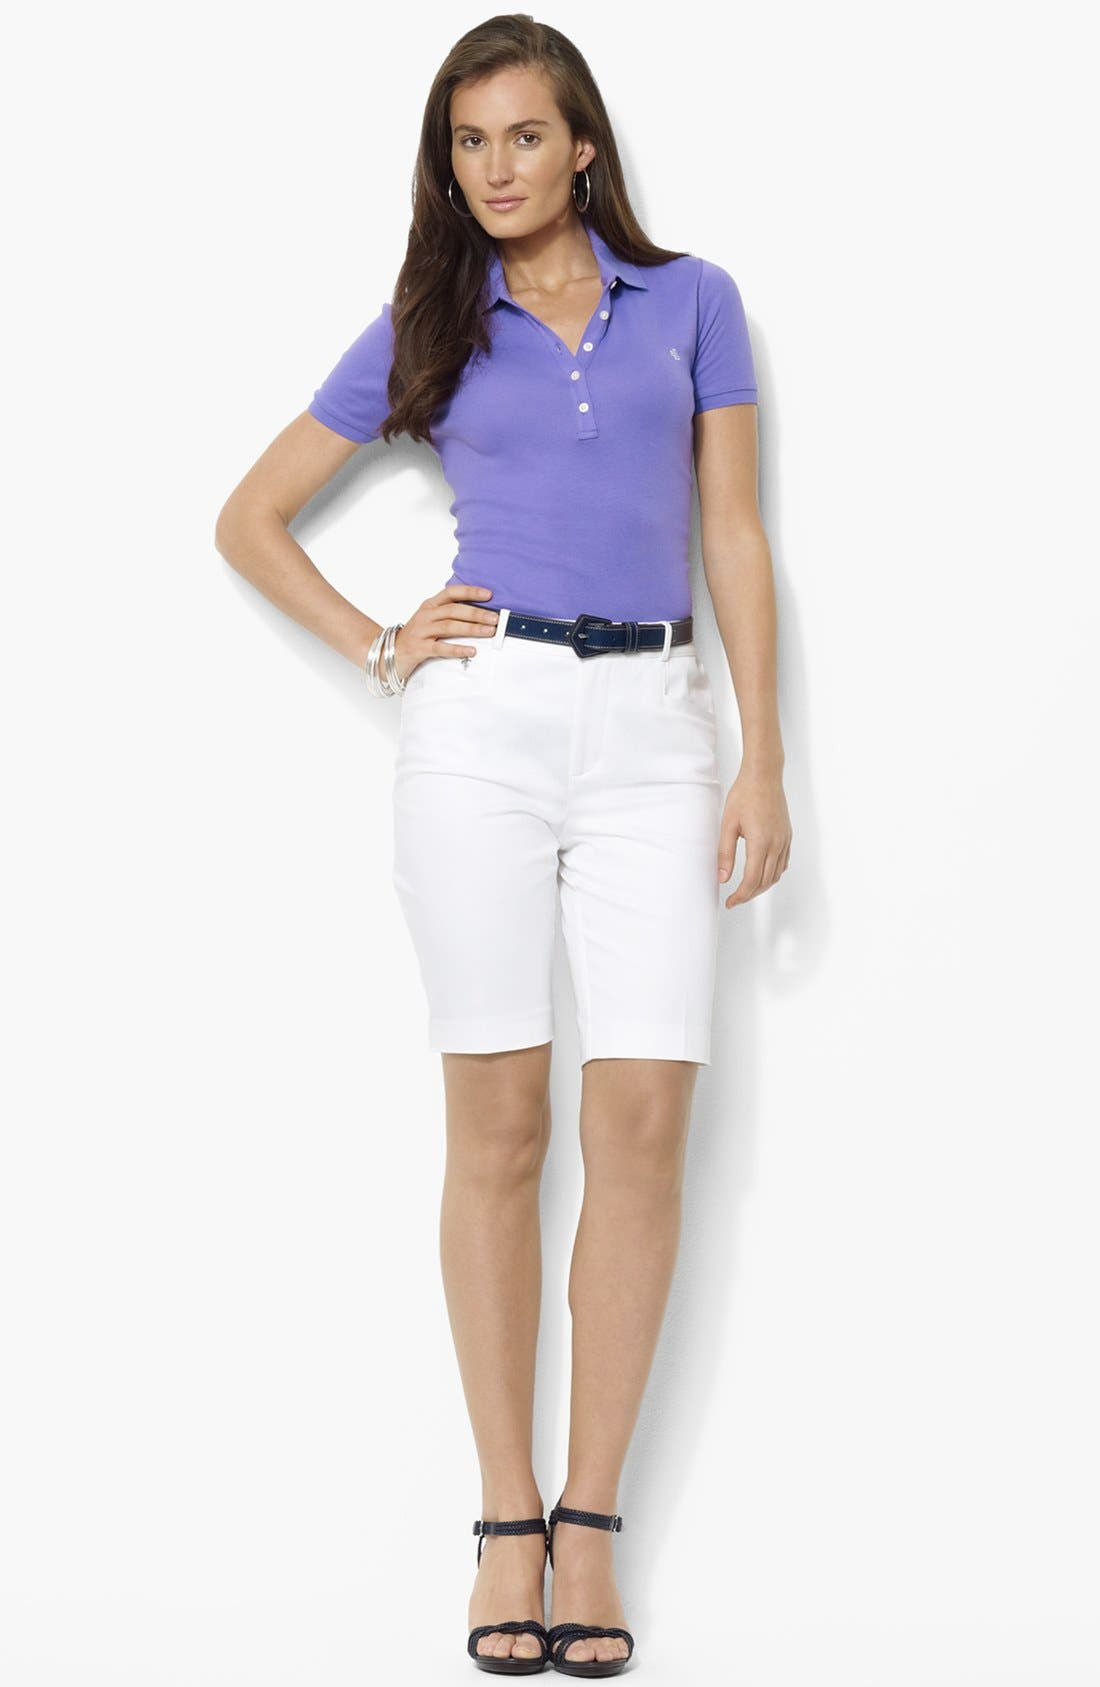 Alternate Image 1 Selected - Lauren Ralph Lauren Slimming Bermuda Shorts (Petite) (Online Only)